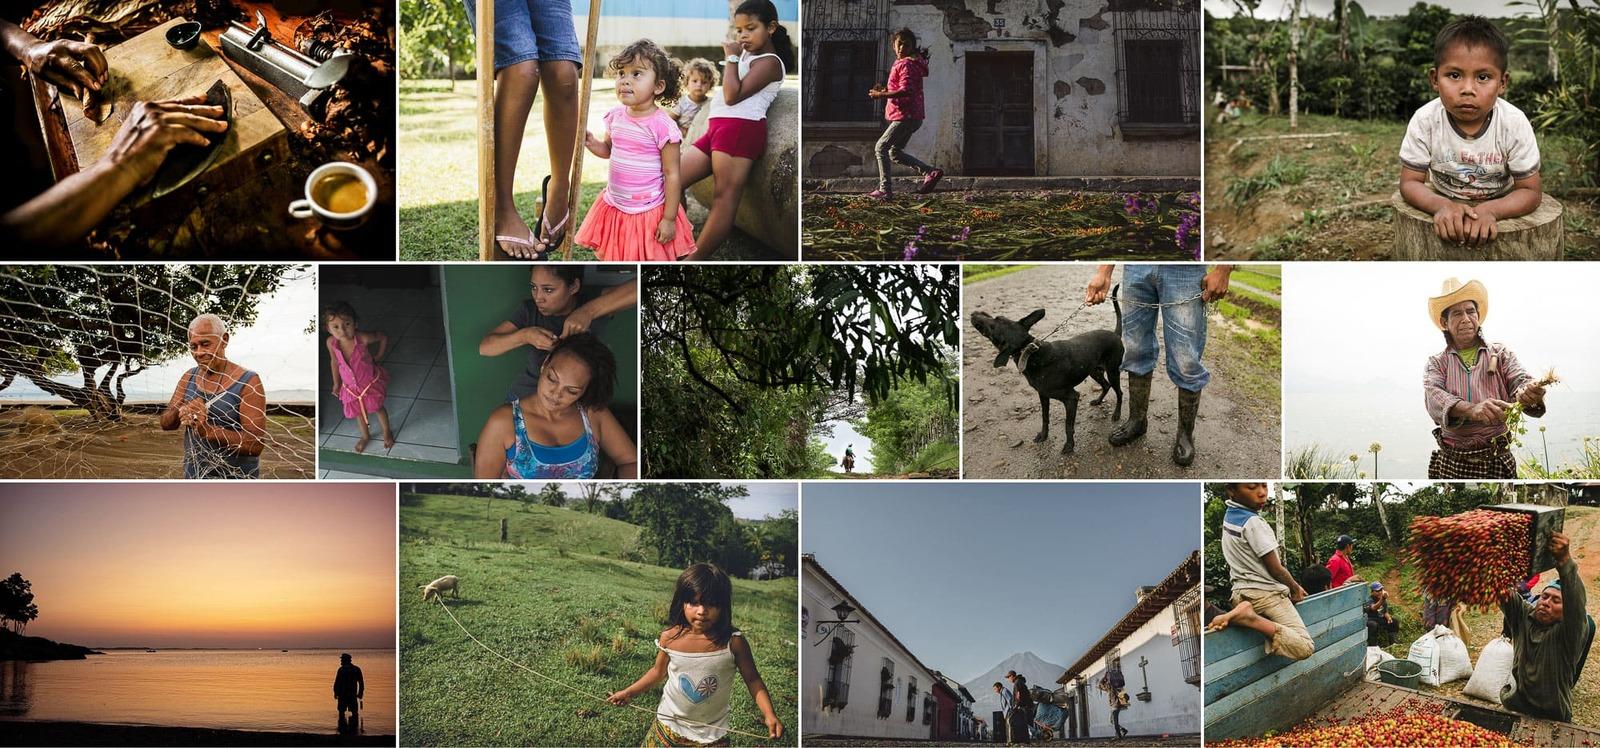 Travel and Culture in Costa Rica